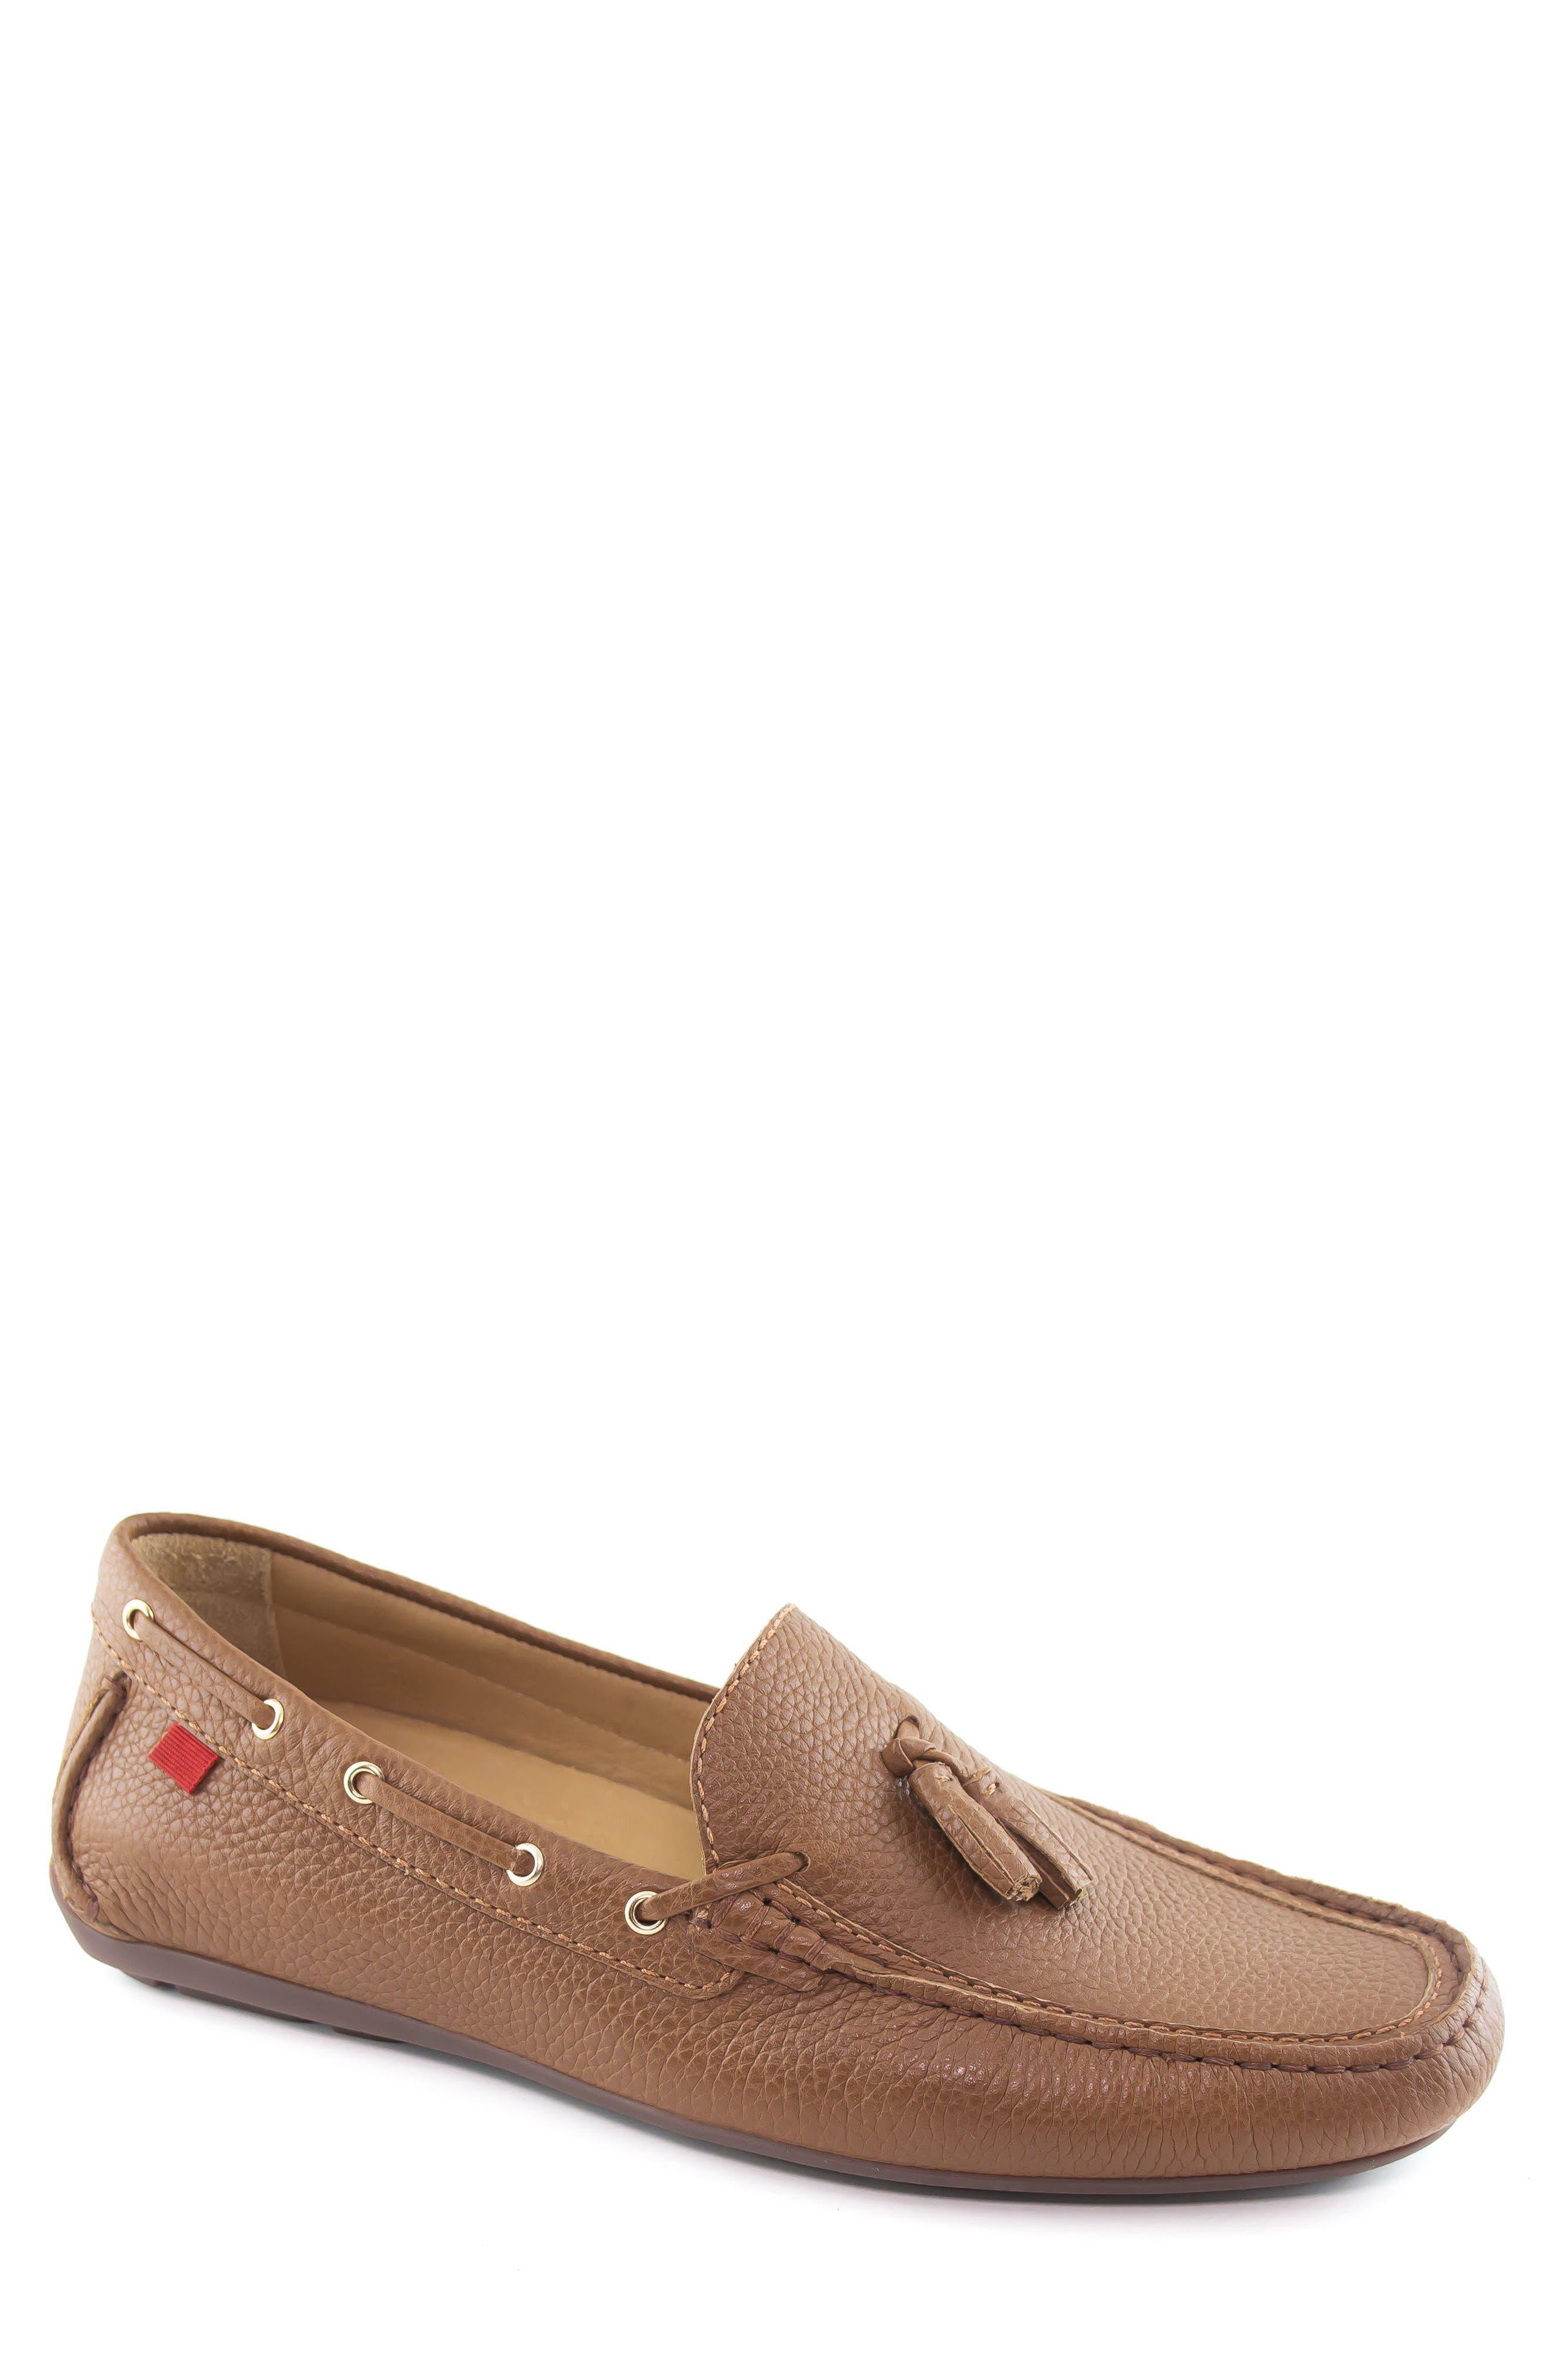 Bushwick Tasseled Driving Loafer,                         Main,                         color, Cognac